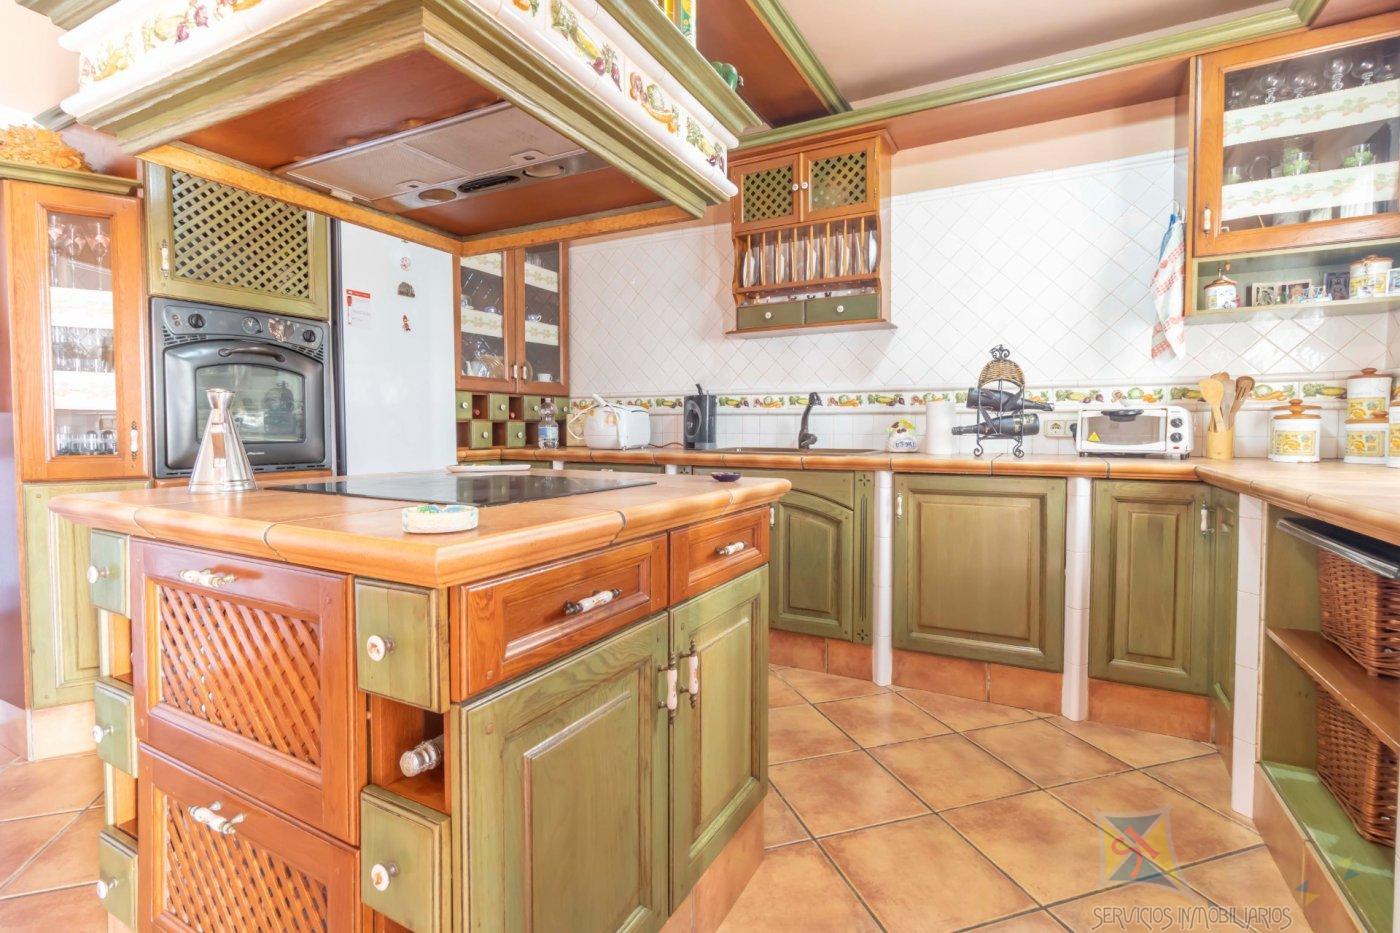 For sale of chalet in El Viso del Alcor